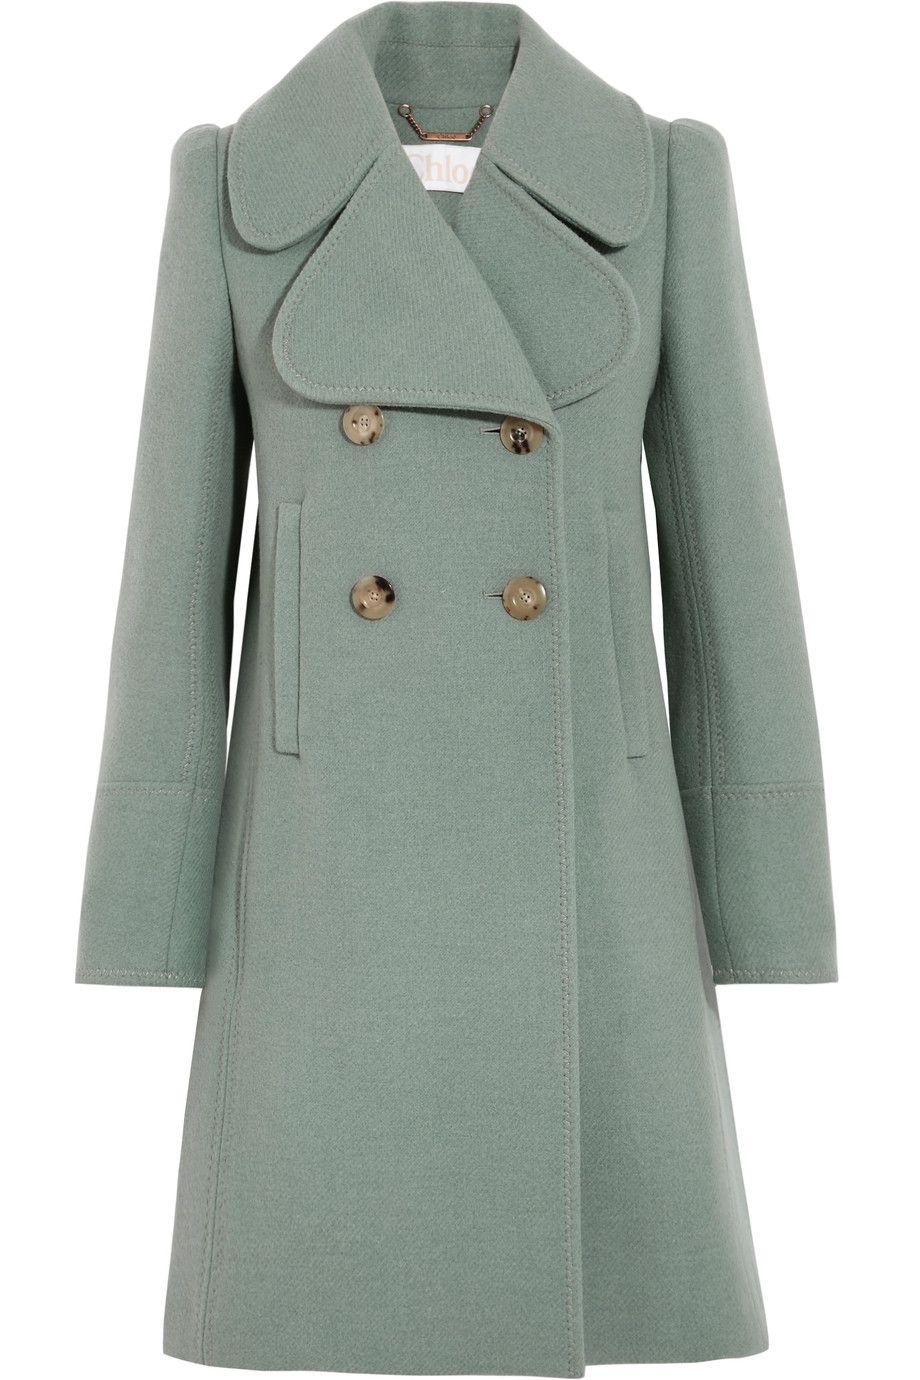 841b826908 Chloé | Double-breasted wool-blend felt coat | NET-A-PORTER.COM ...